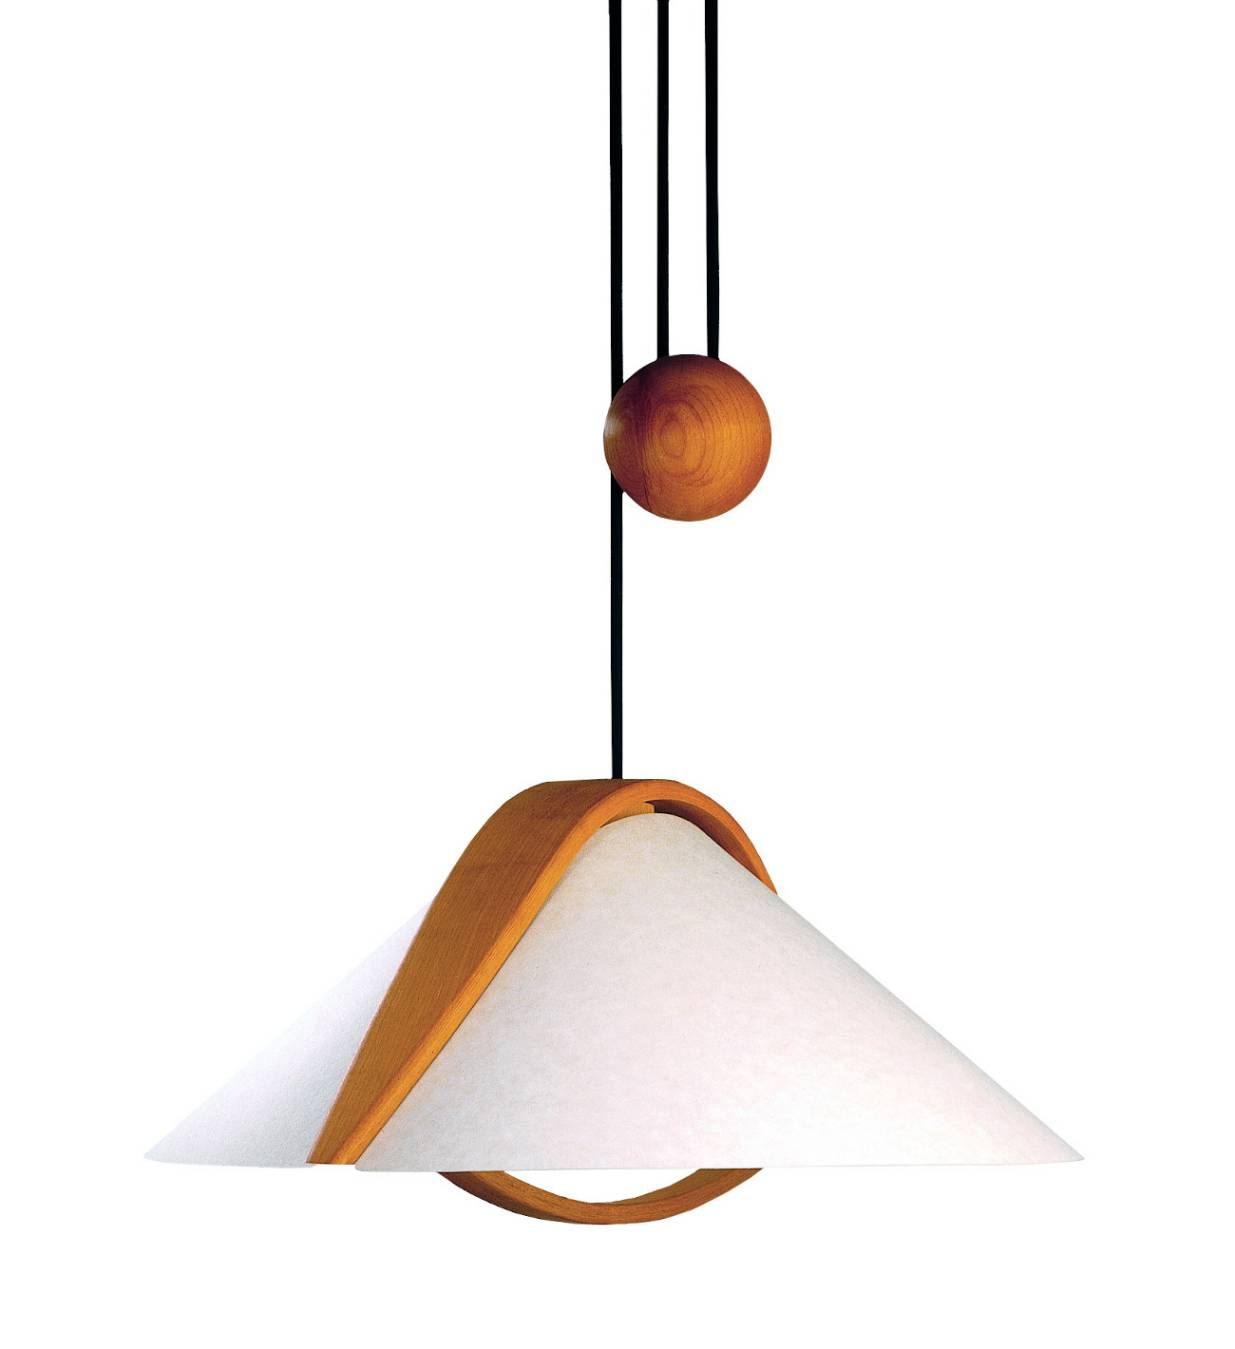 Domus Arta Pendelleuchte Design Leuchte